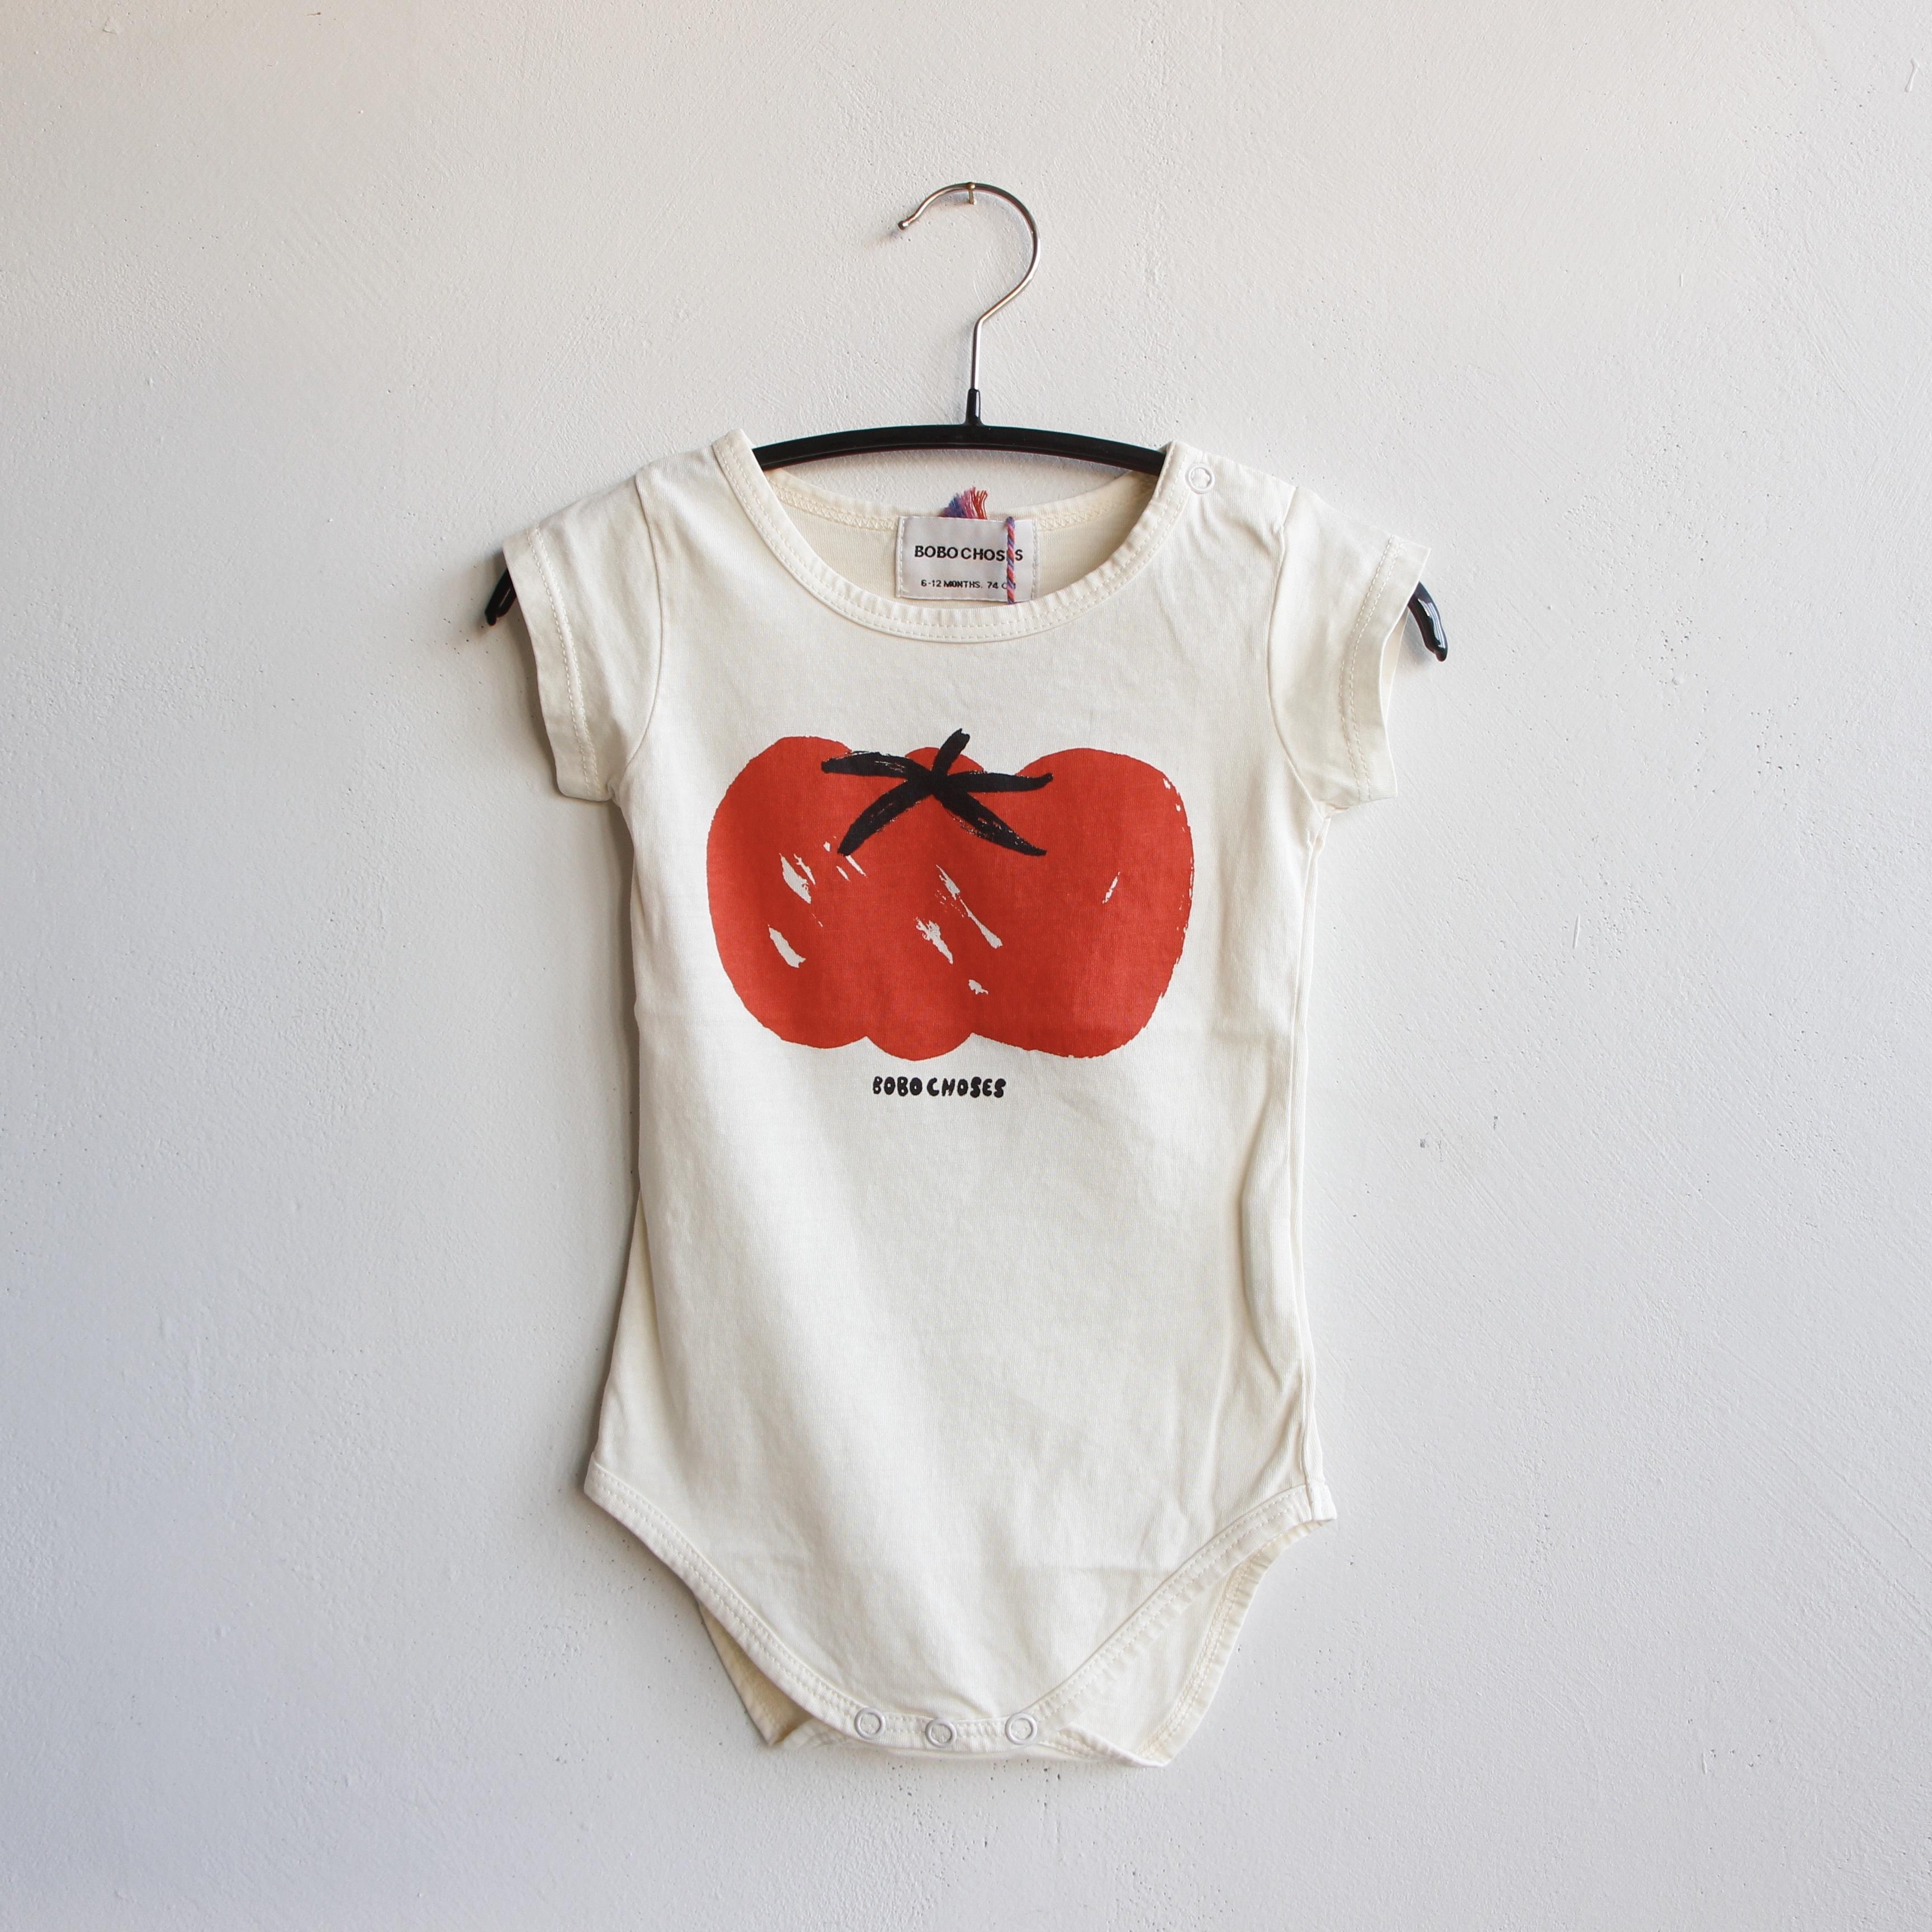 《BOBO CHOSES 2021SS》Tomato Short sleeve Body / 6-12M